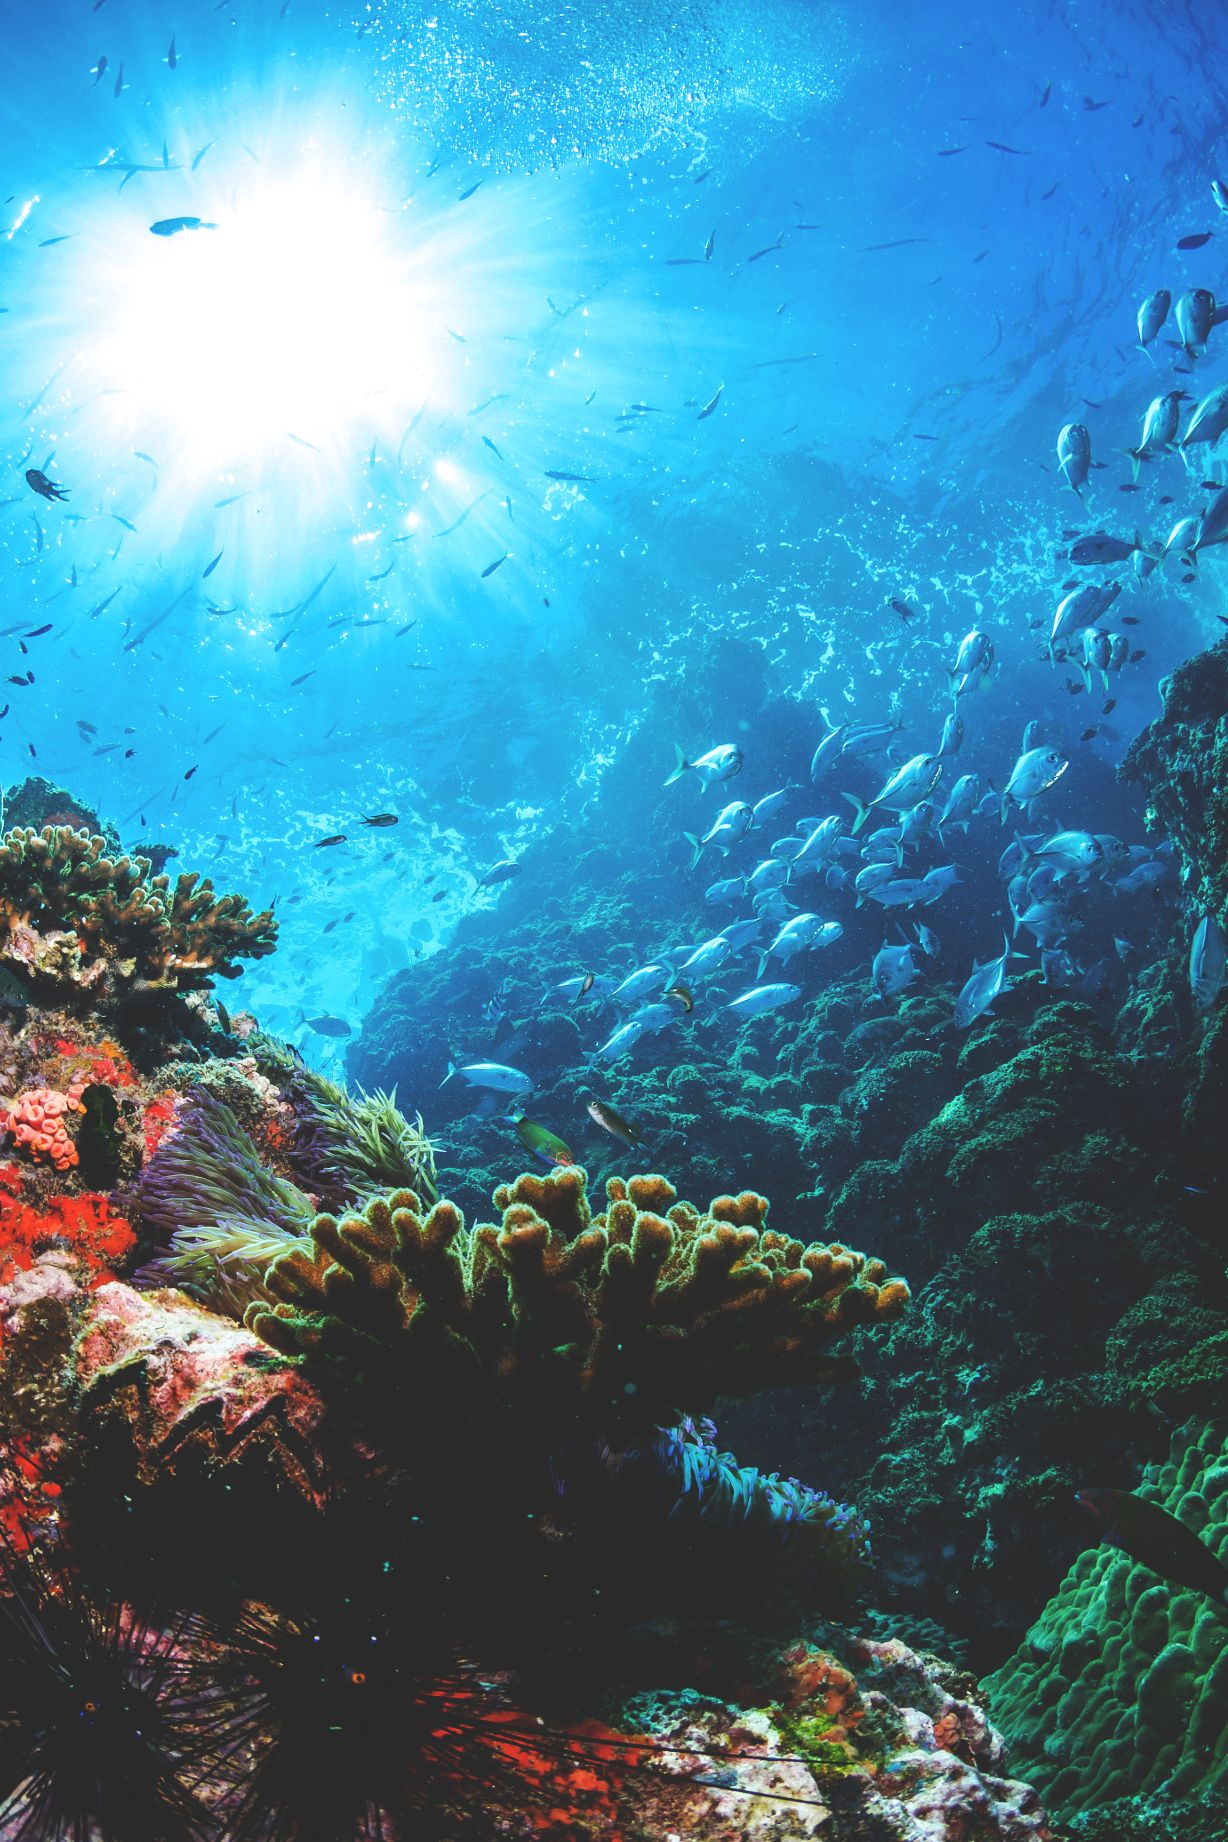 wavemotions Stairway … ! Underwater photography ocean